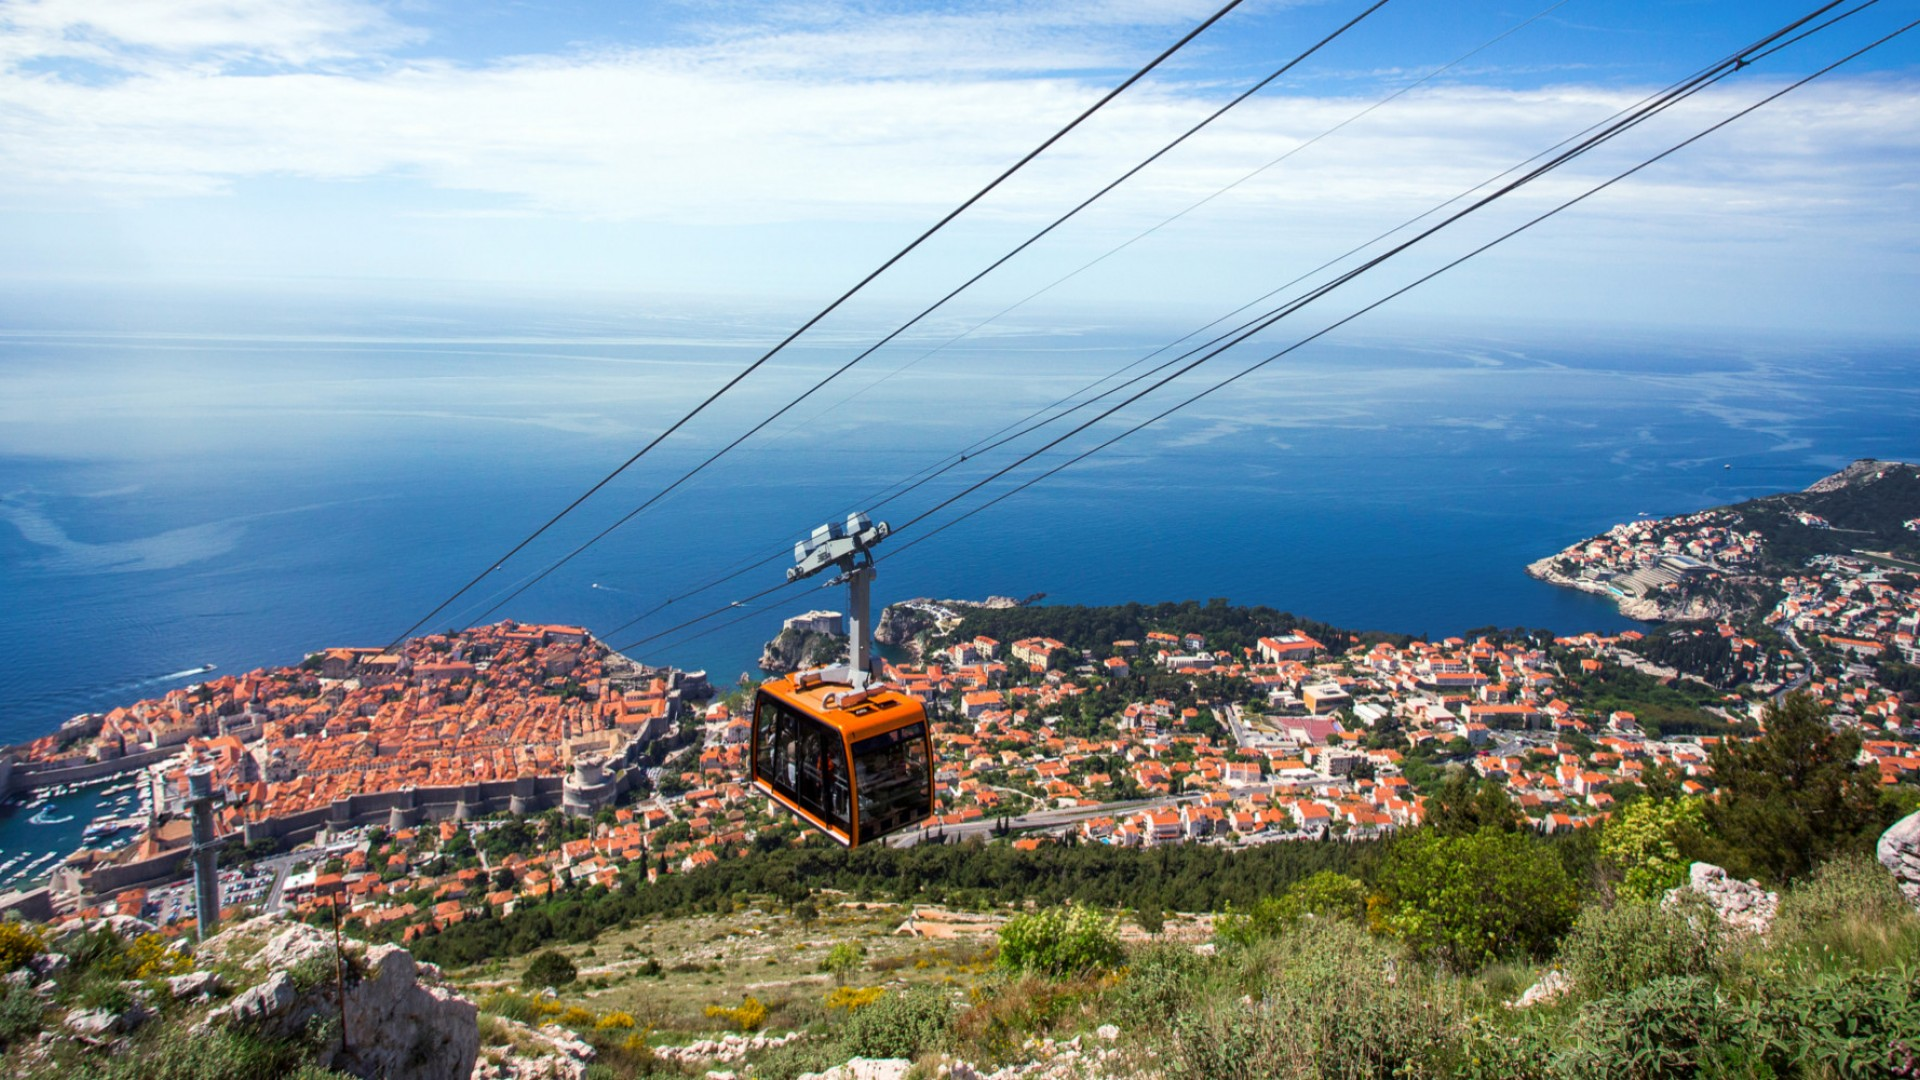 Cable Car Dubrovnik, Croatia